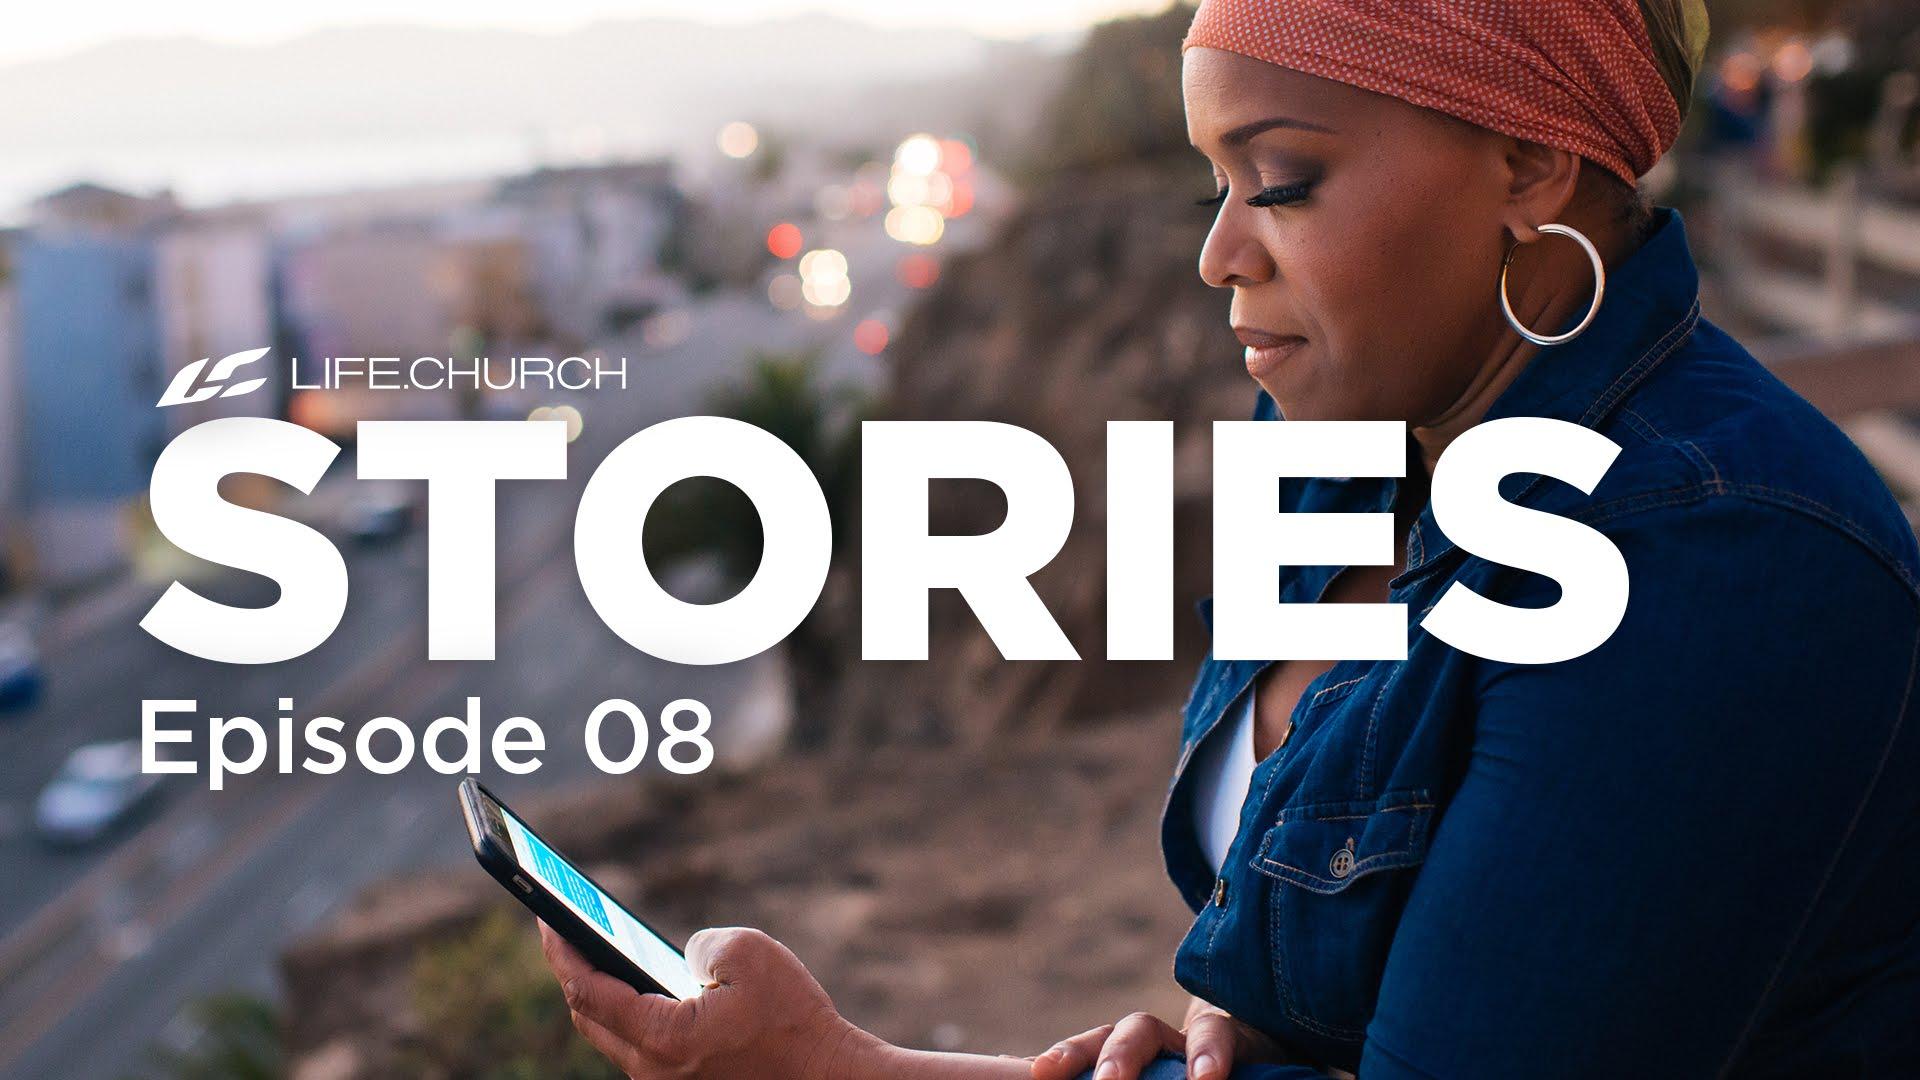 Episode 08 thumbnail